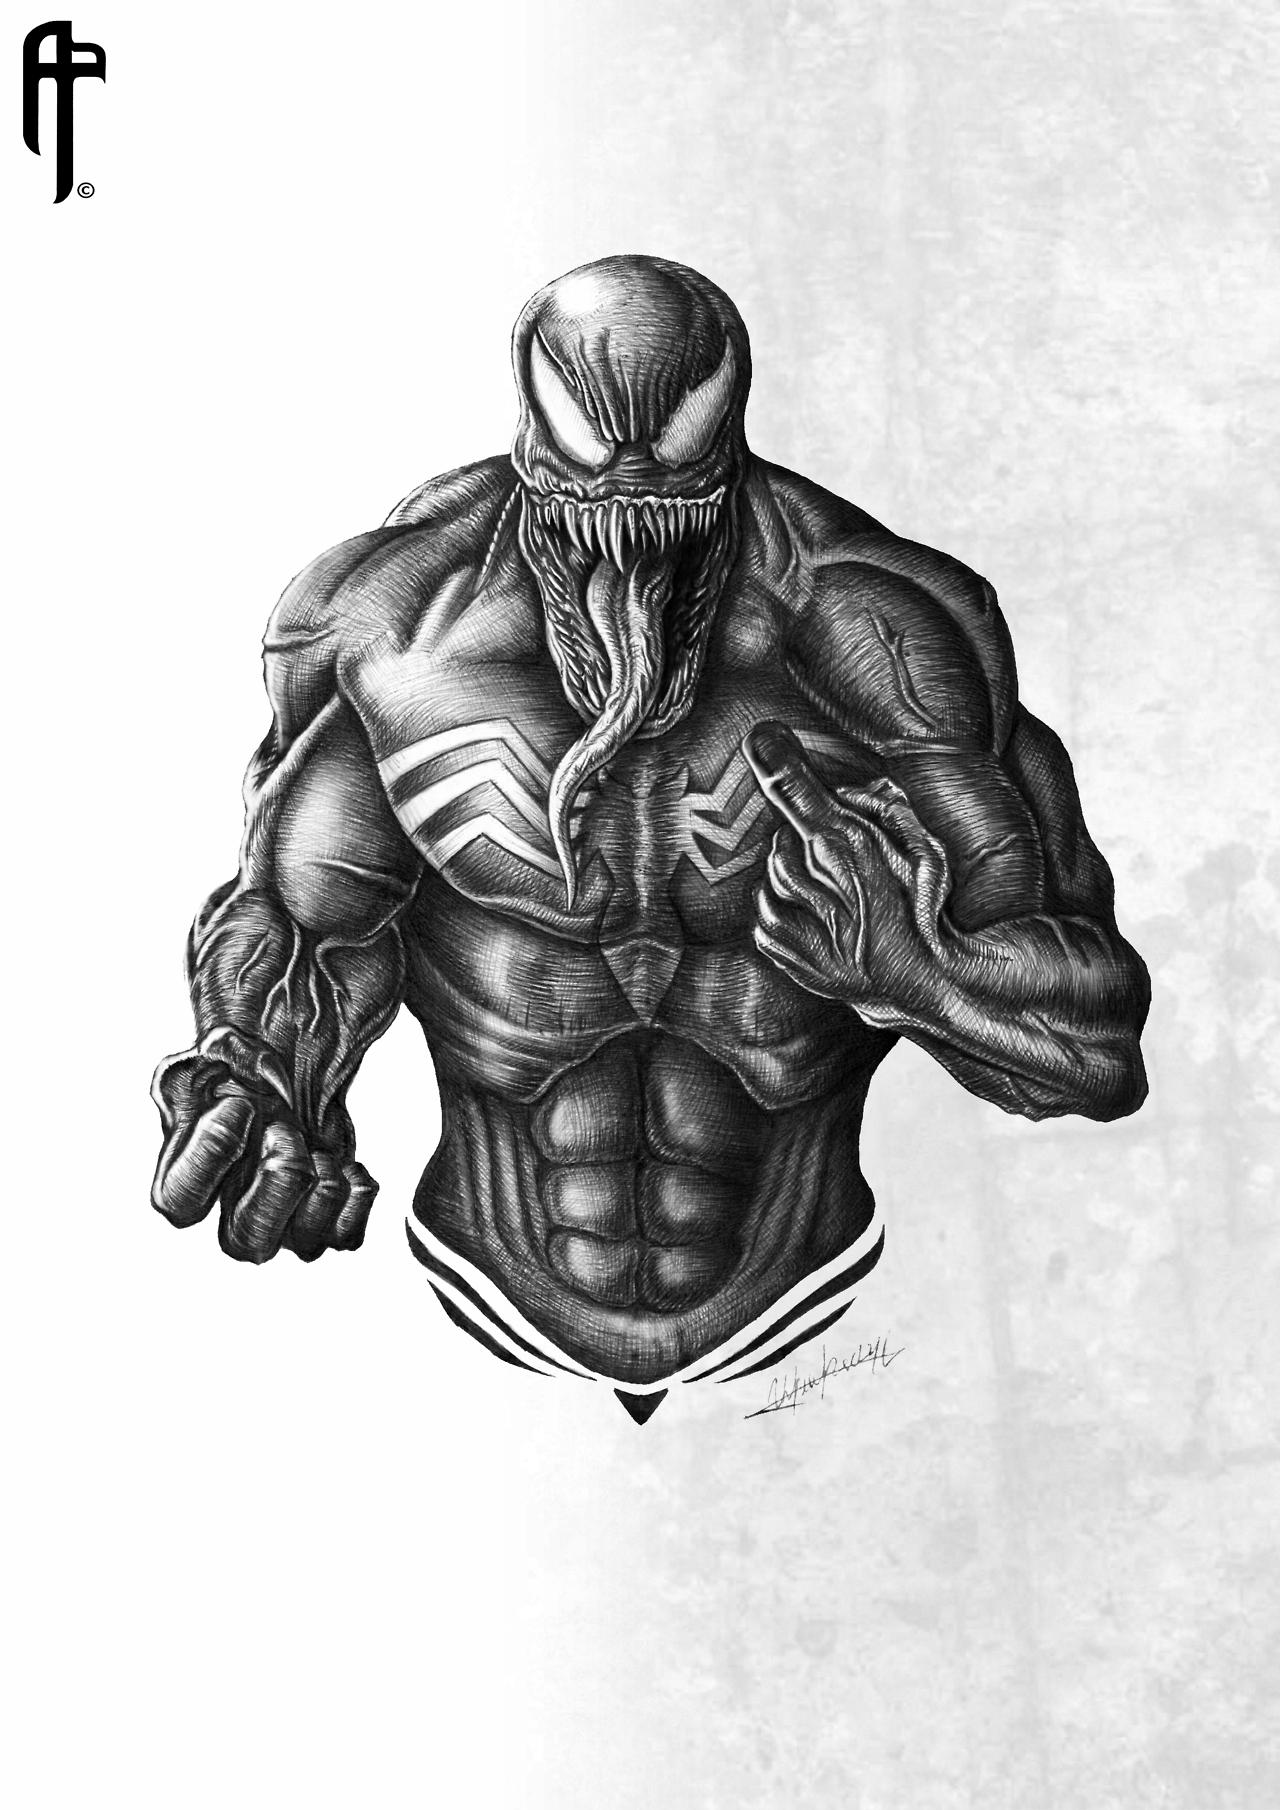 Pin By Cles B On Venom Venom Comics Venom Art Venom Tattoo